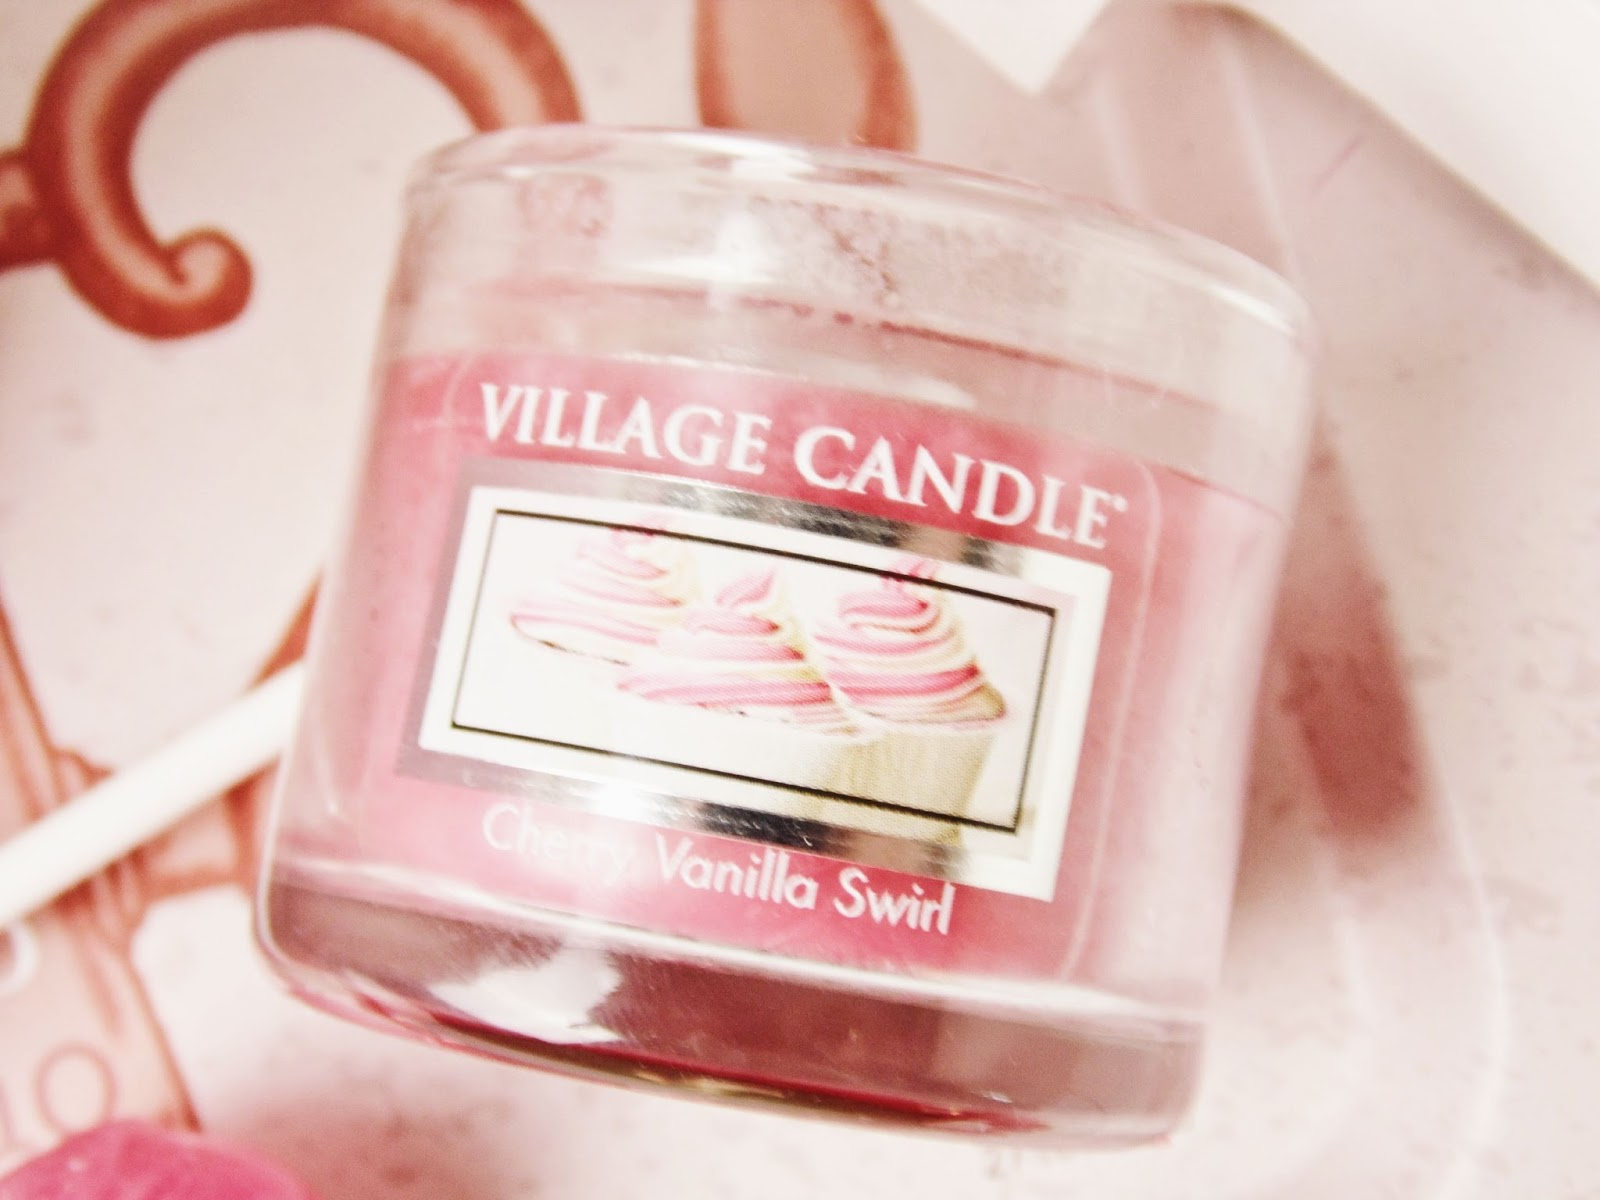 village candle cherry vanilla swirl recenzja